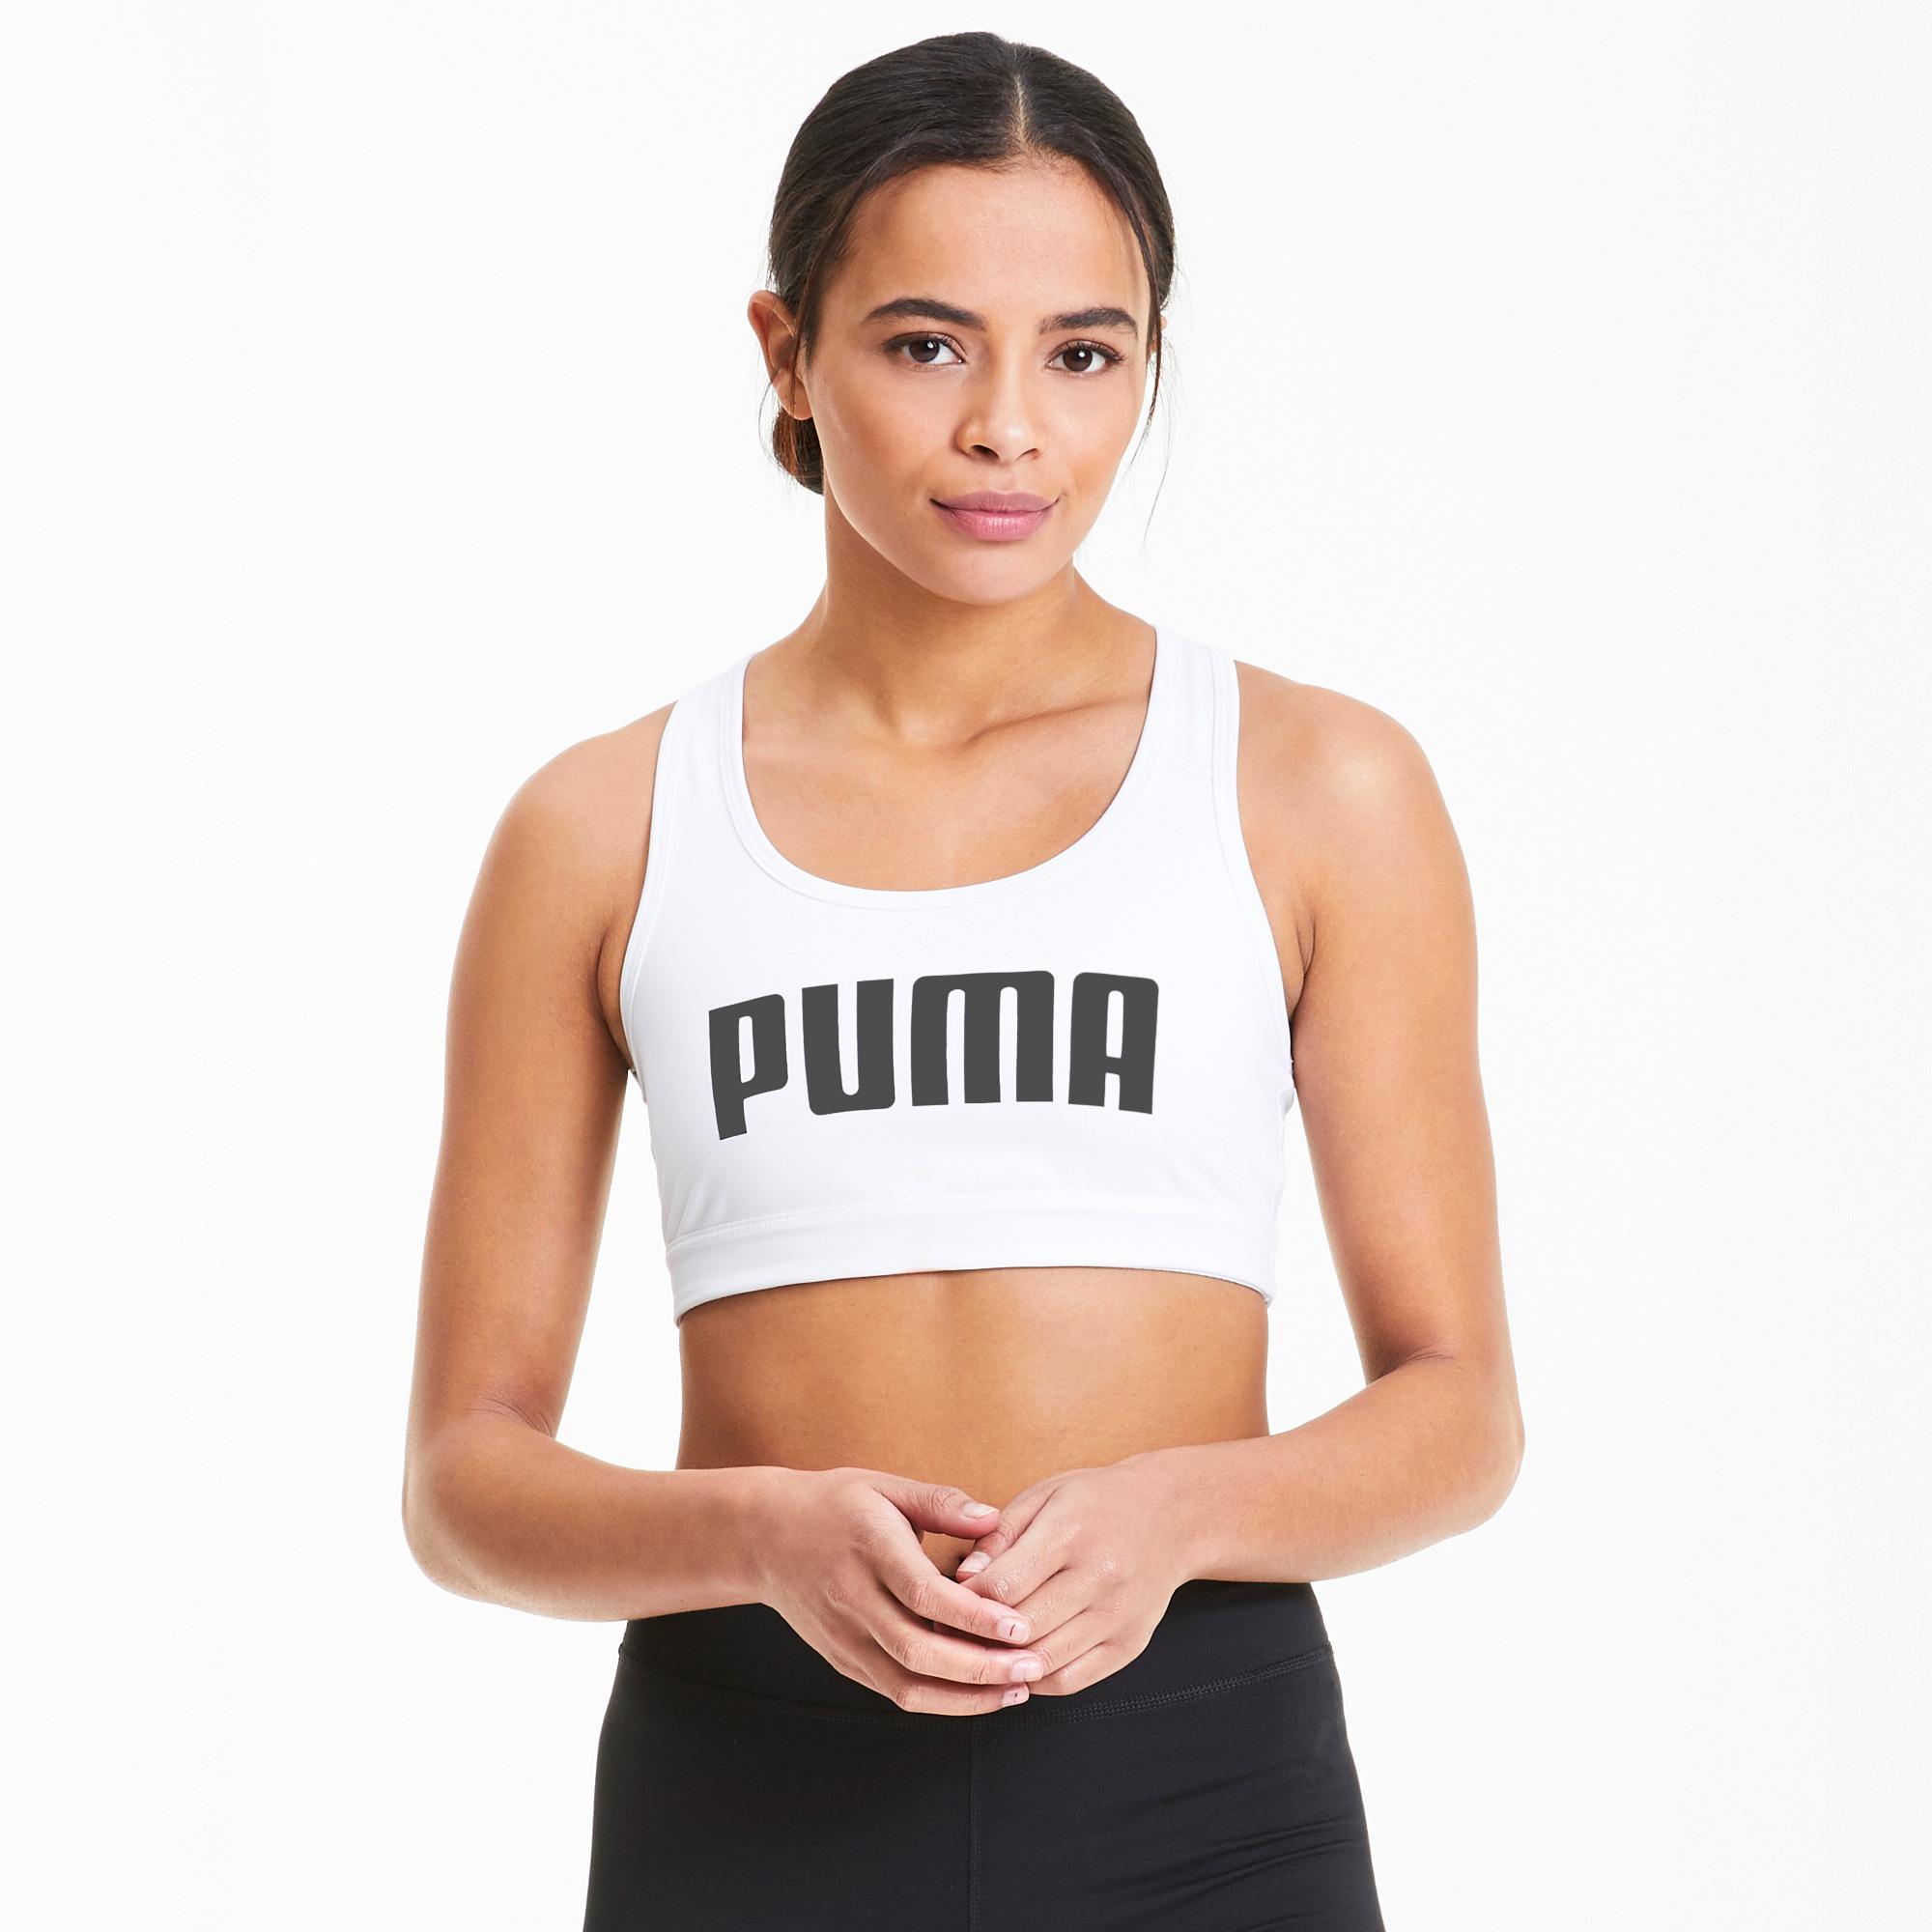 Puma 4KeeBra Kadın Beyaz Bra